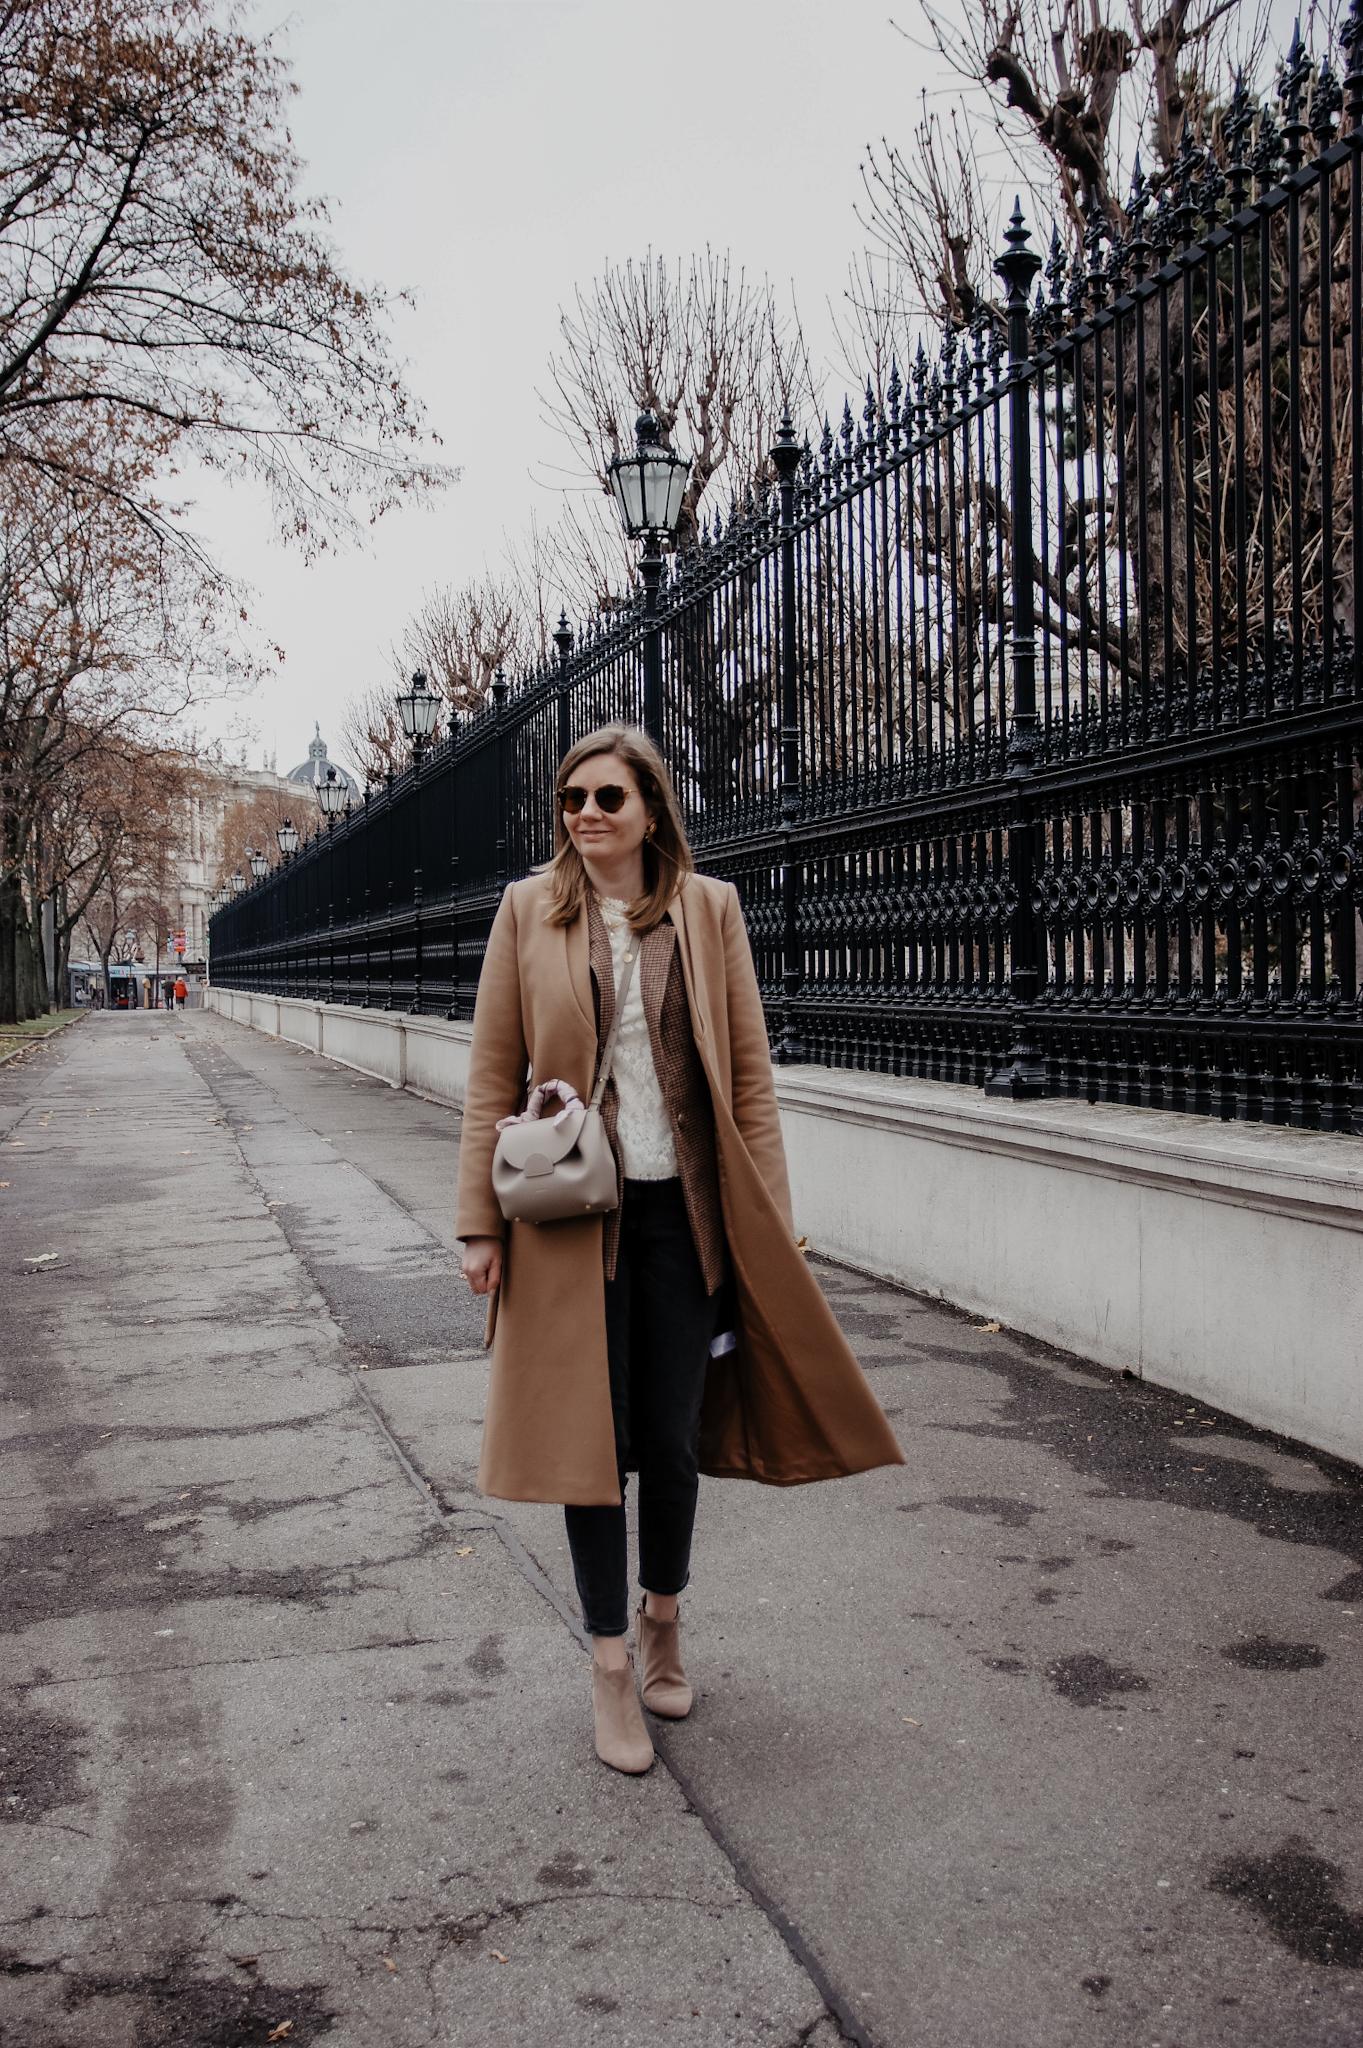 Winter Outfit Blazer, Jeans, Polene, Bluse camel coat